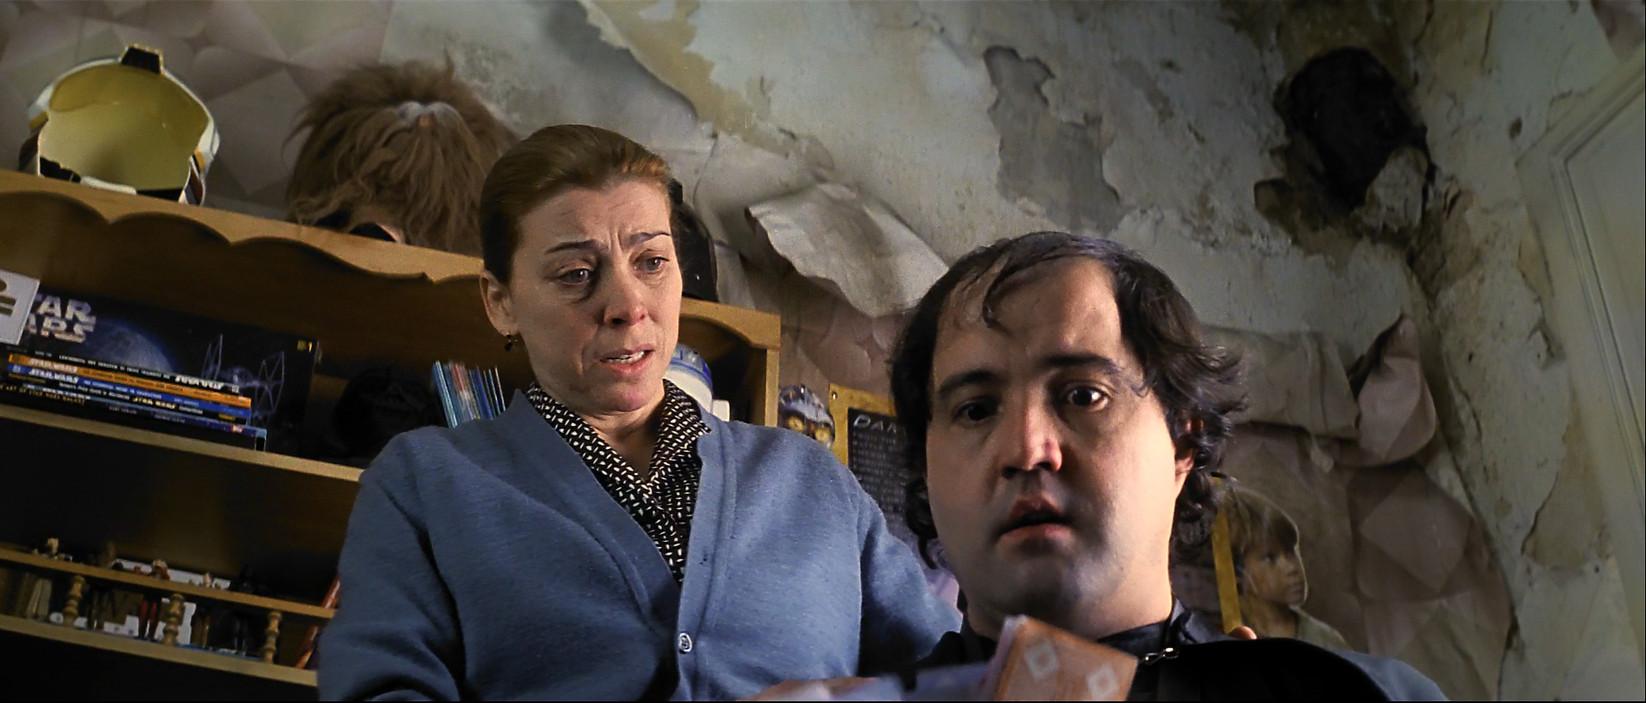 qloI2F - La comunidad   2000   Comedia negra. Thriller   BDrip 1080p   castellano DTS 5.1   10,7 GB